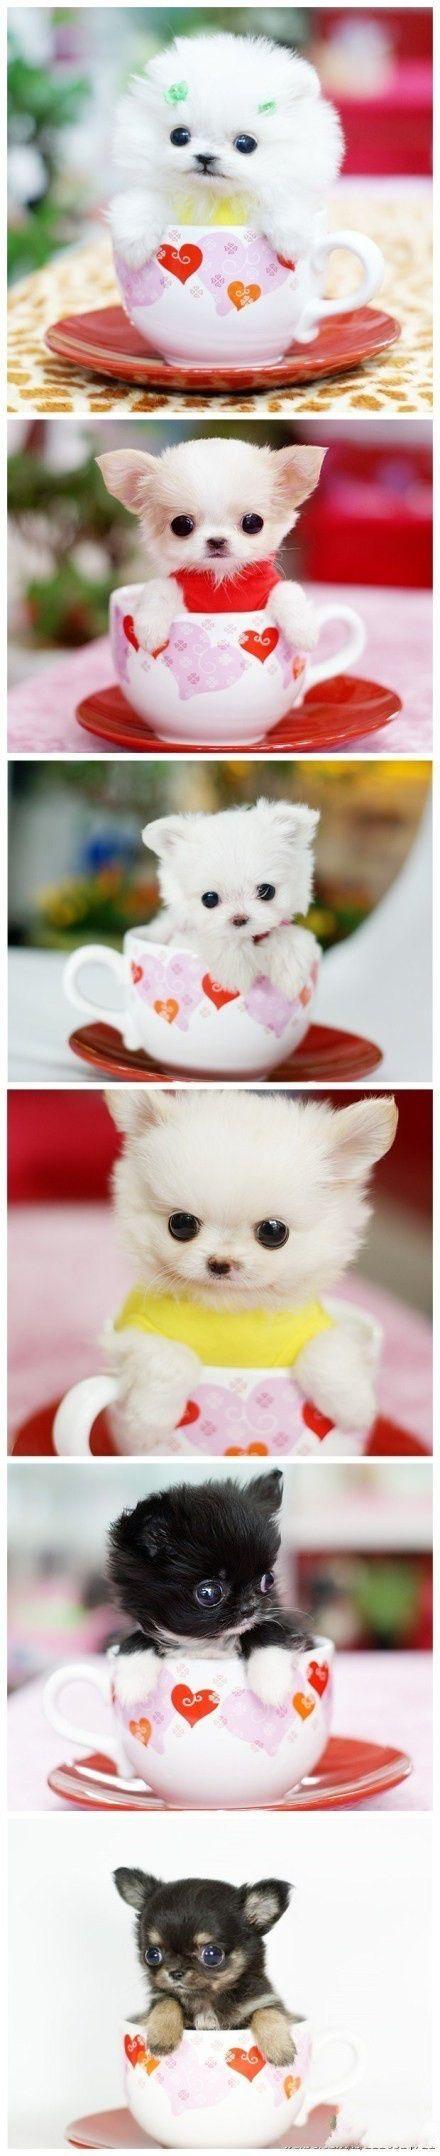 cute dogsxox ahhh so smalllxox